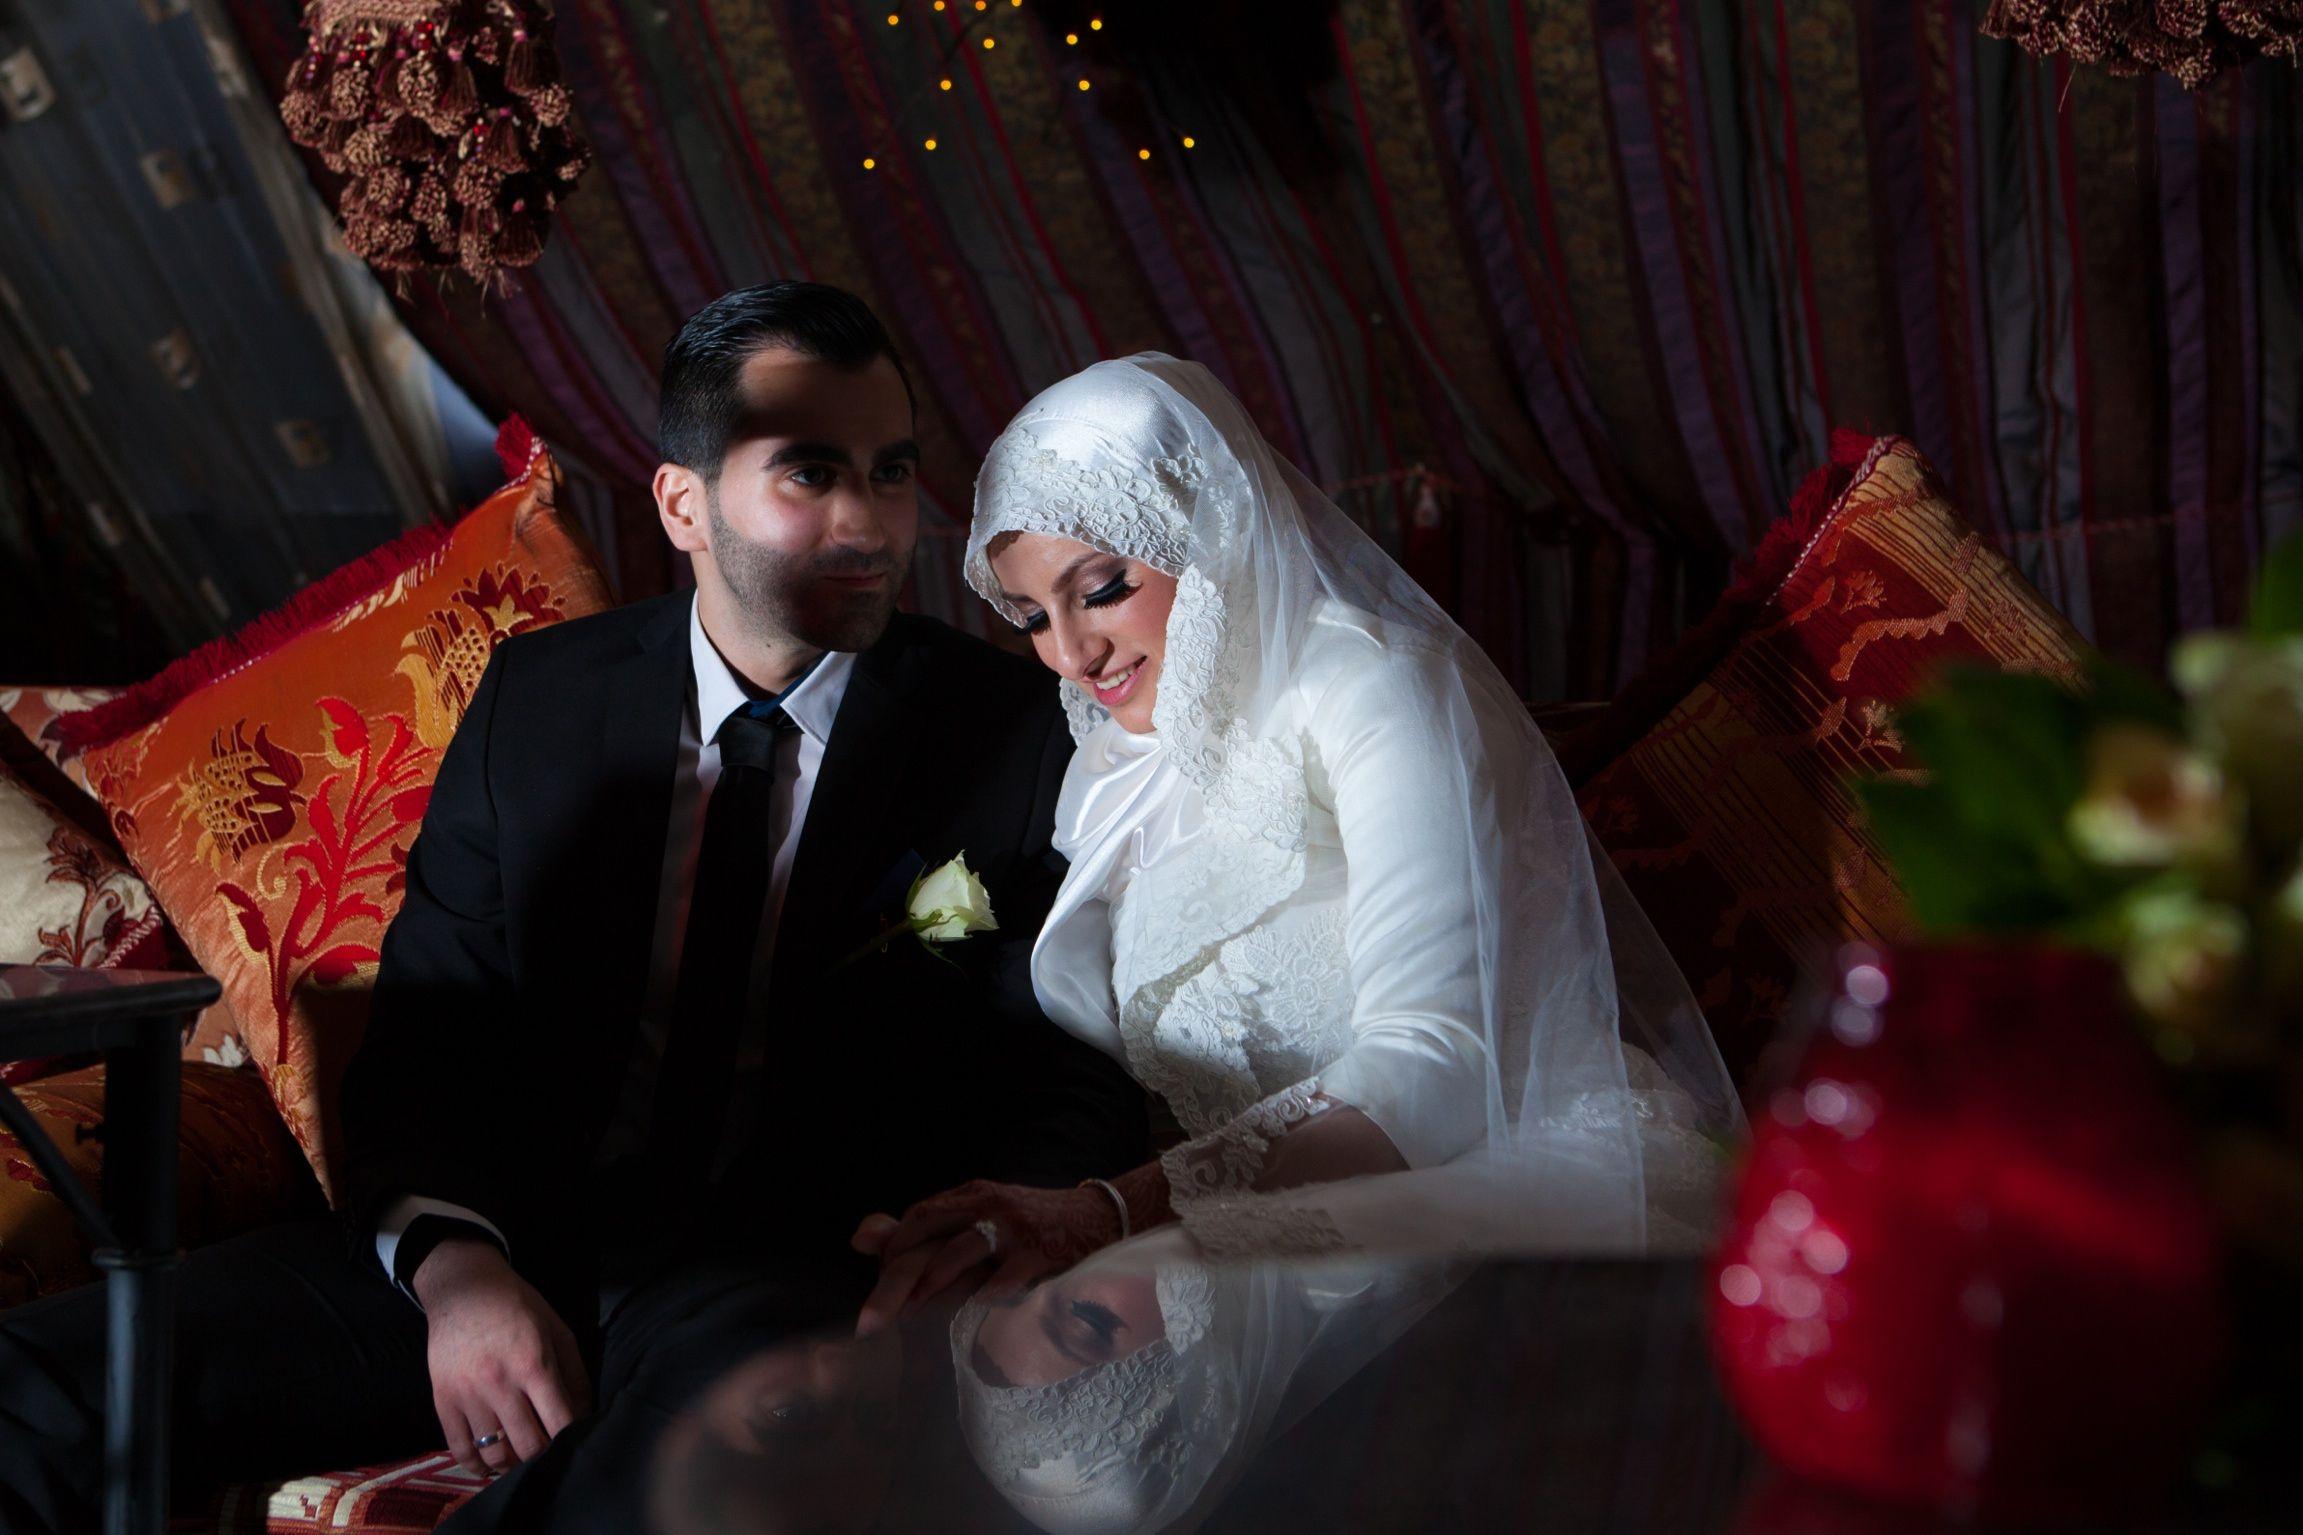 Smile #dugunfotografcisi #dugunfotograflari #izmirhilton #izmirdugunfotografcisi #dugunhikayesi #dugunhikayeleri #unutulmazhikayeler #weddingphotographer #wedding #izmir #istanbul #amsterdam